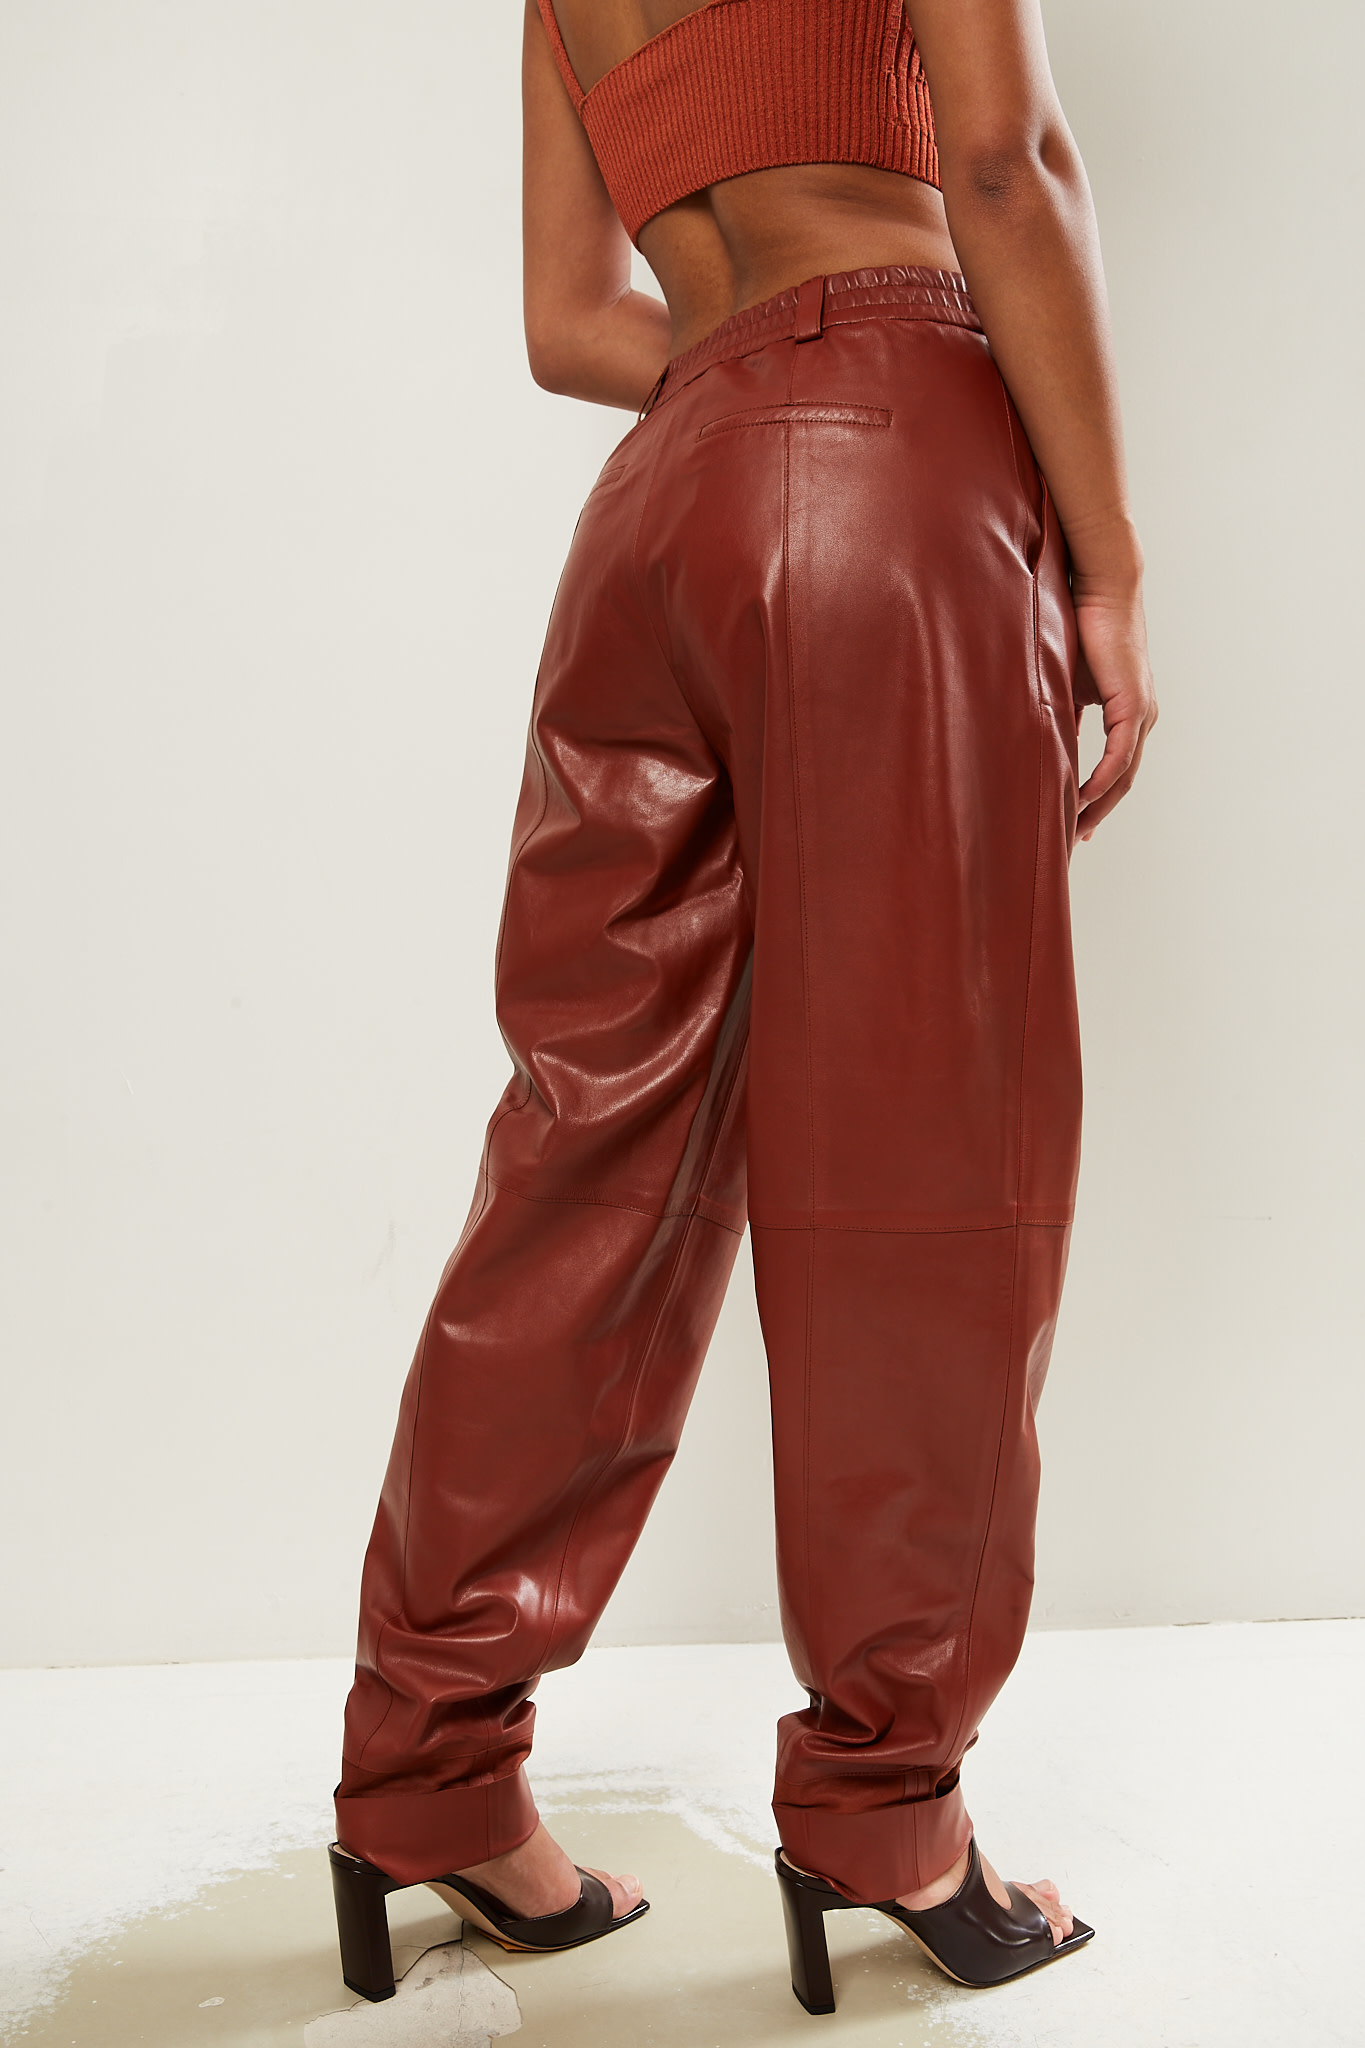 Aeron - Imago trousers